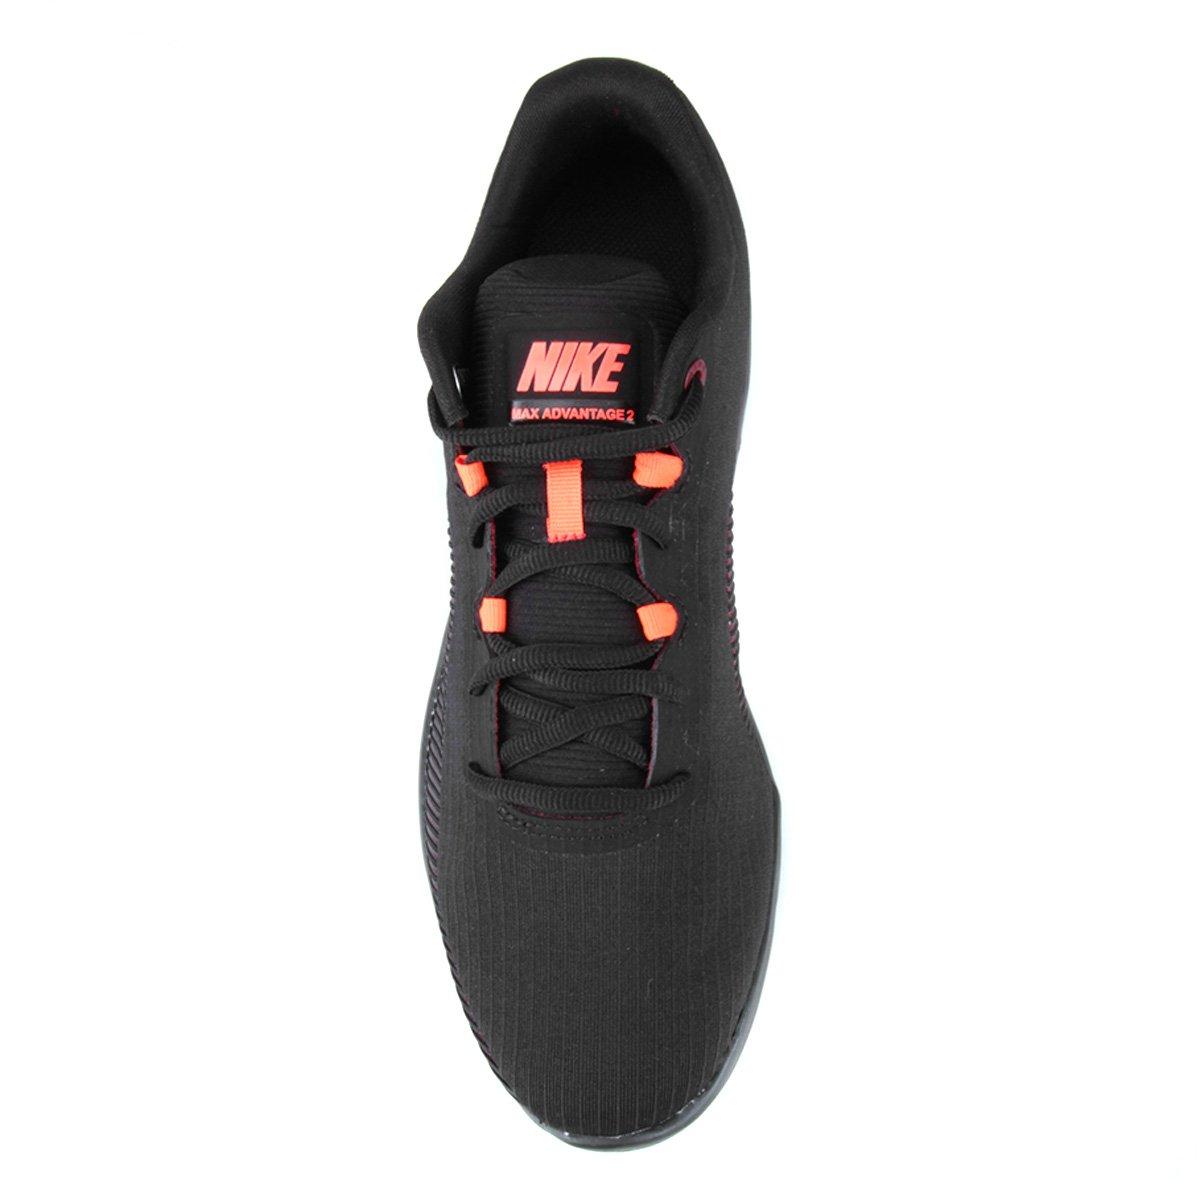 Tênis Nike Air Max Advantage 2 Masculino Preto E Vermelho